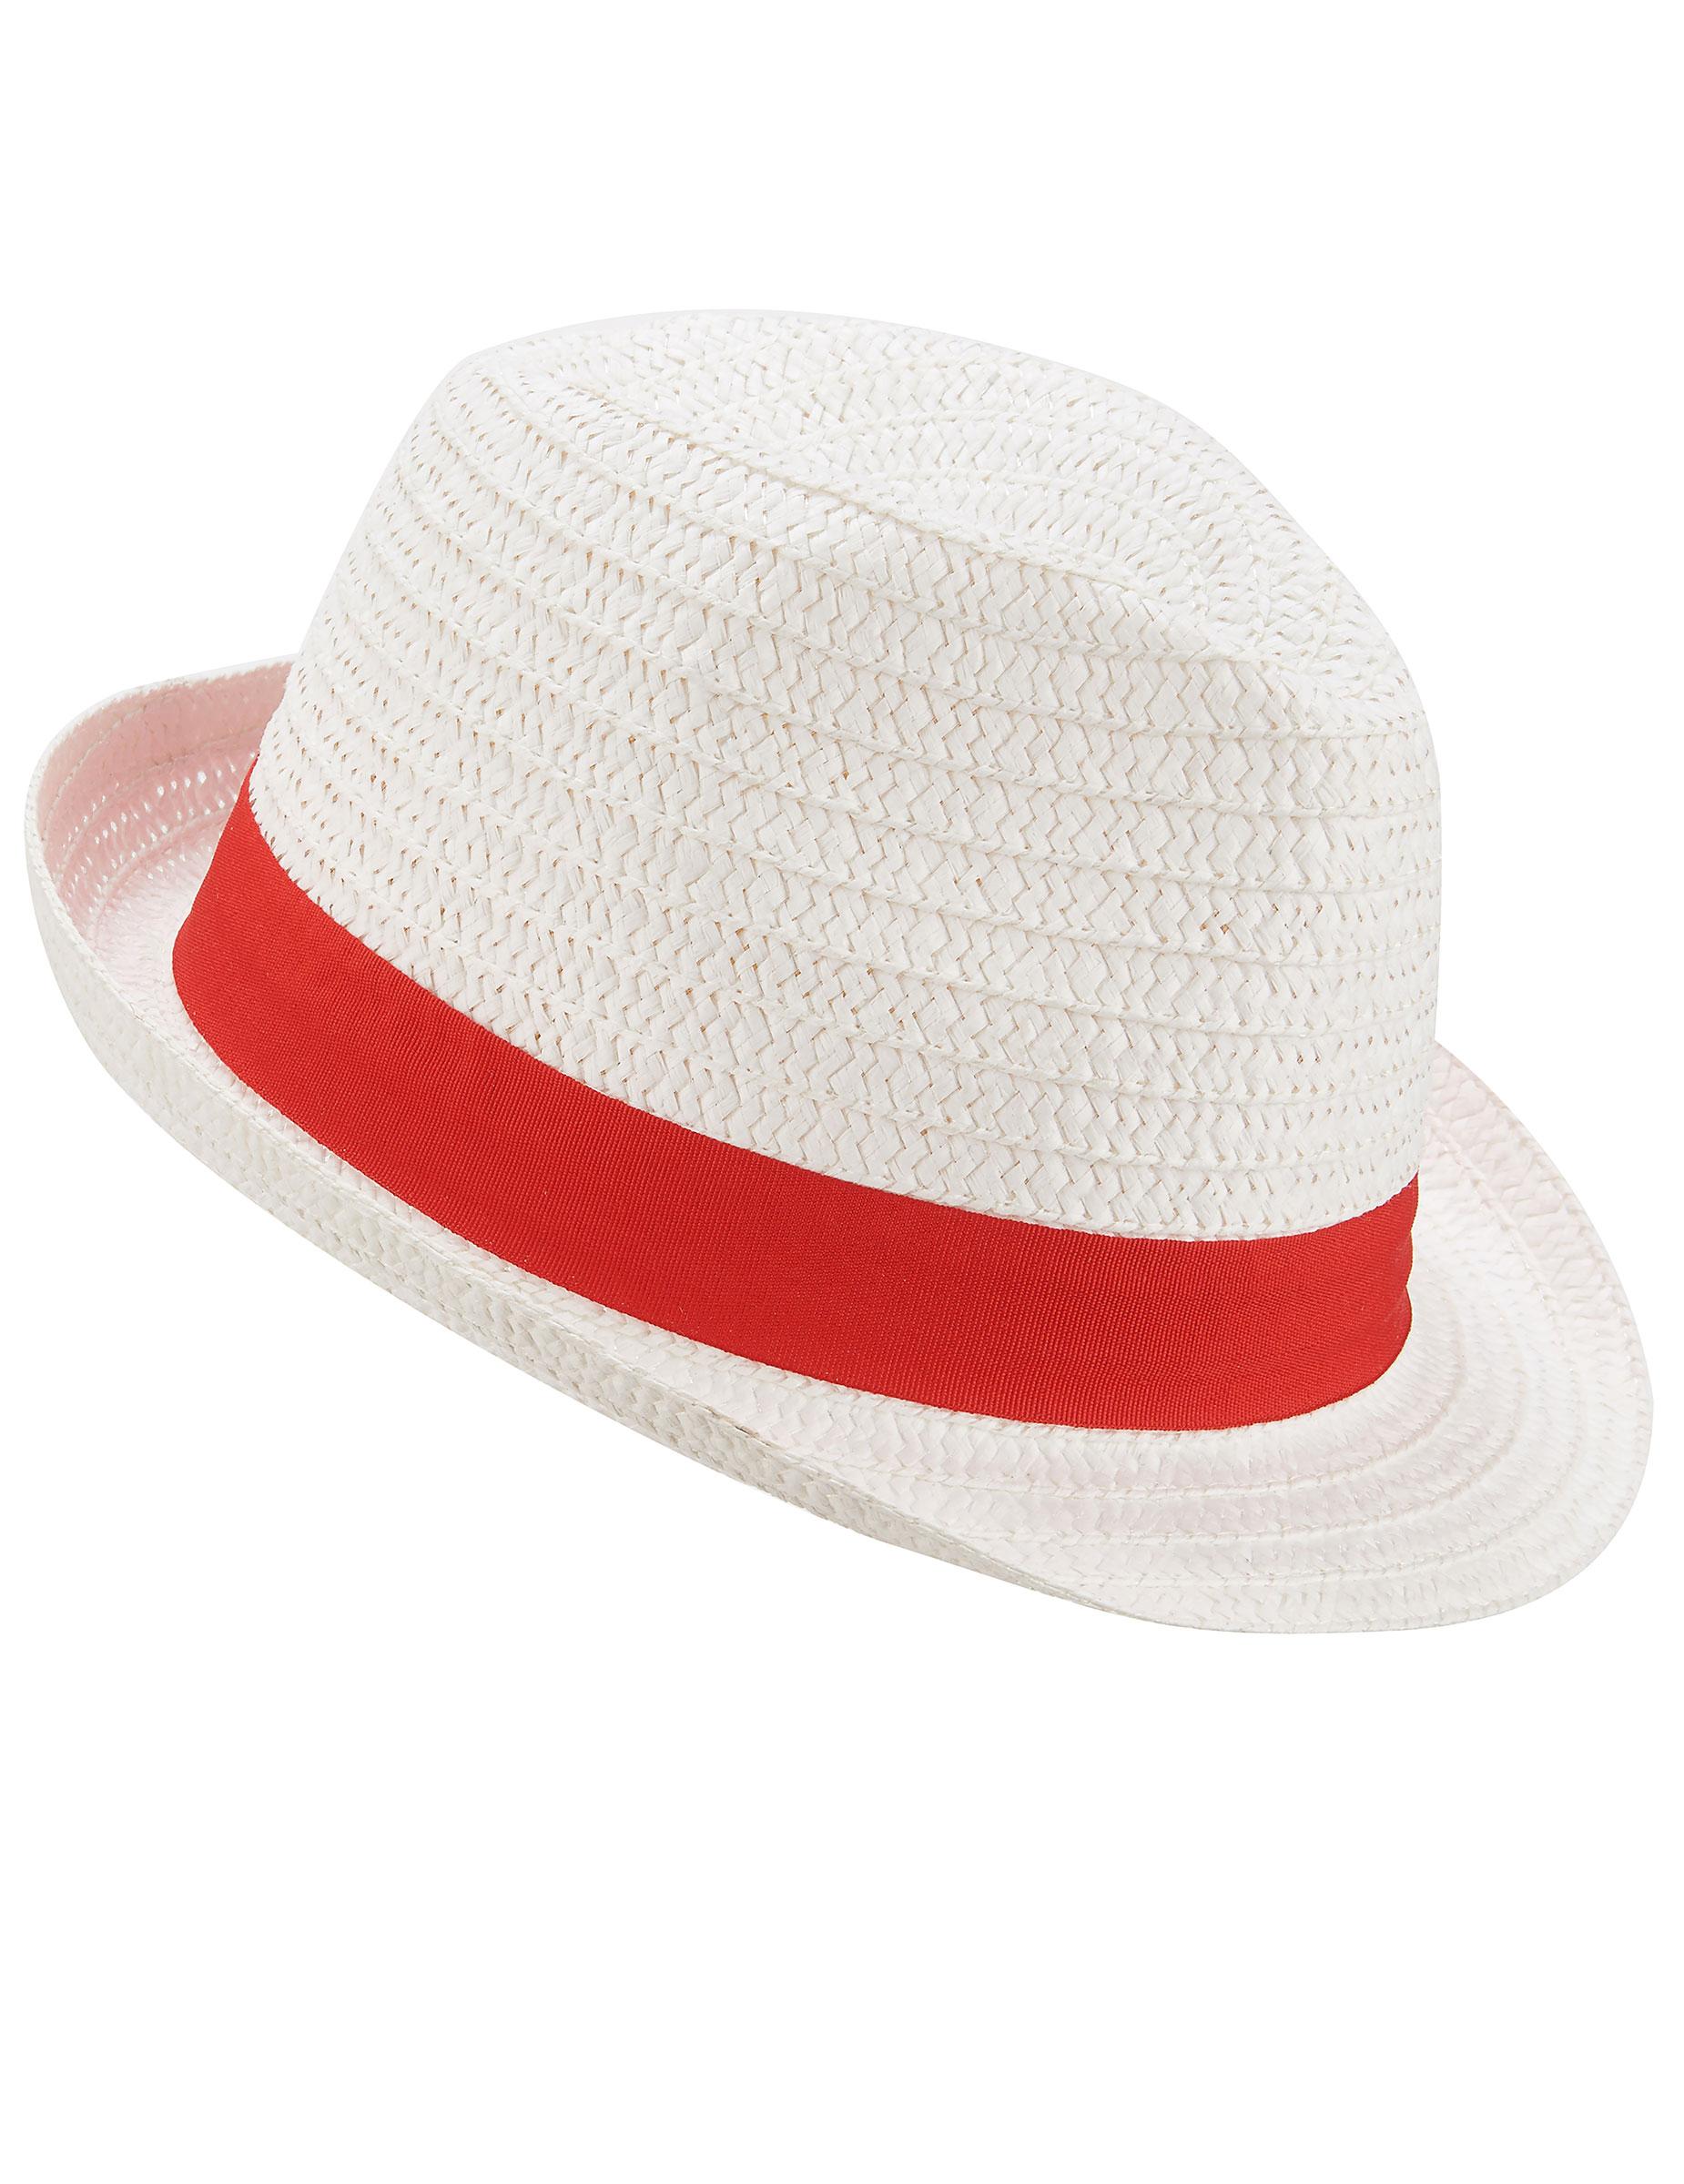 da2a131e984 Chapeau borsalino blanc avec bande rouge adulte   Deguise-toi